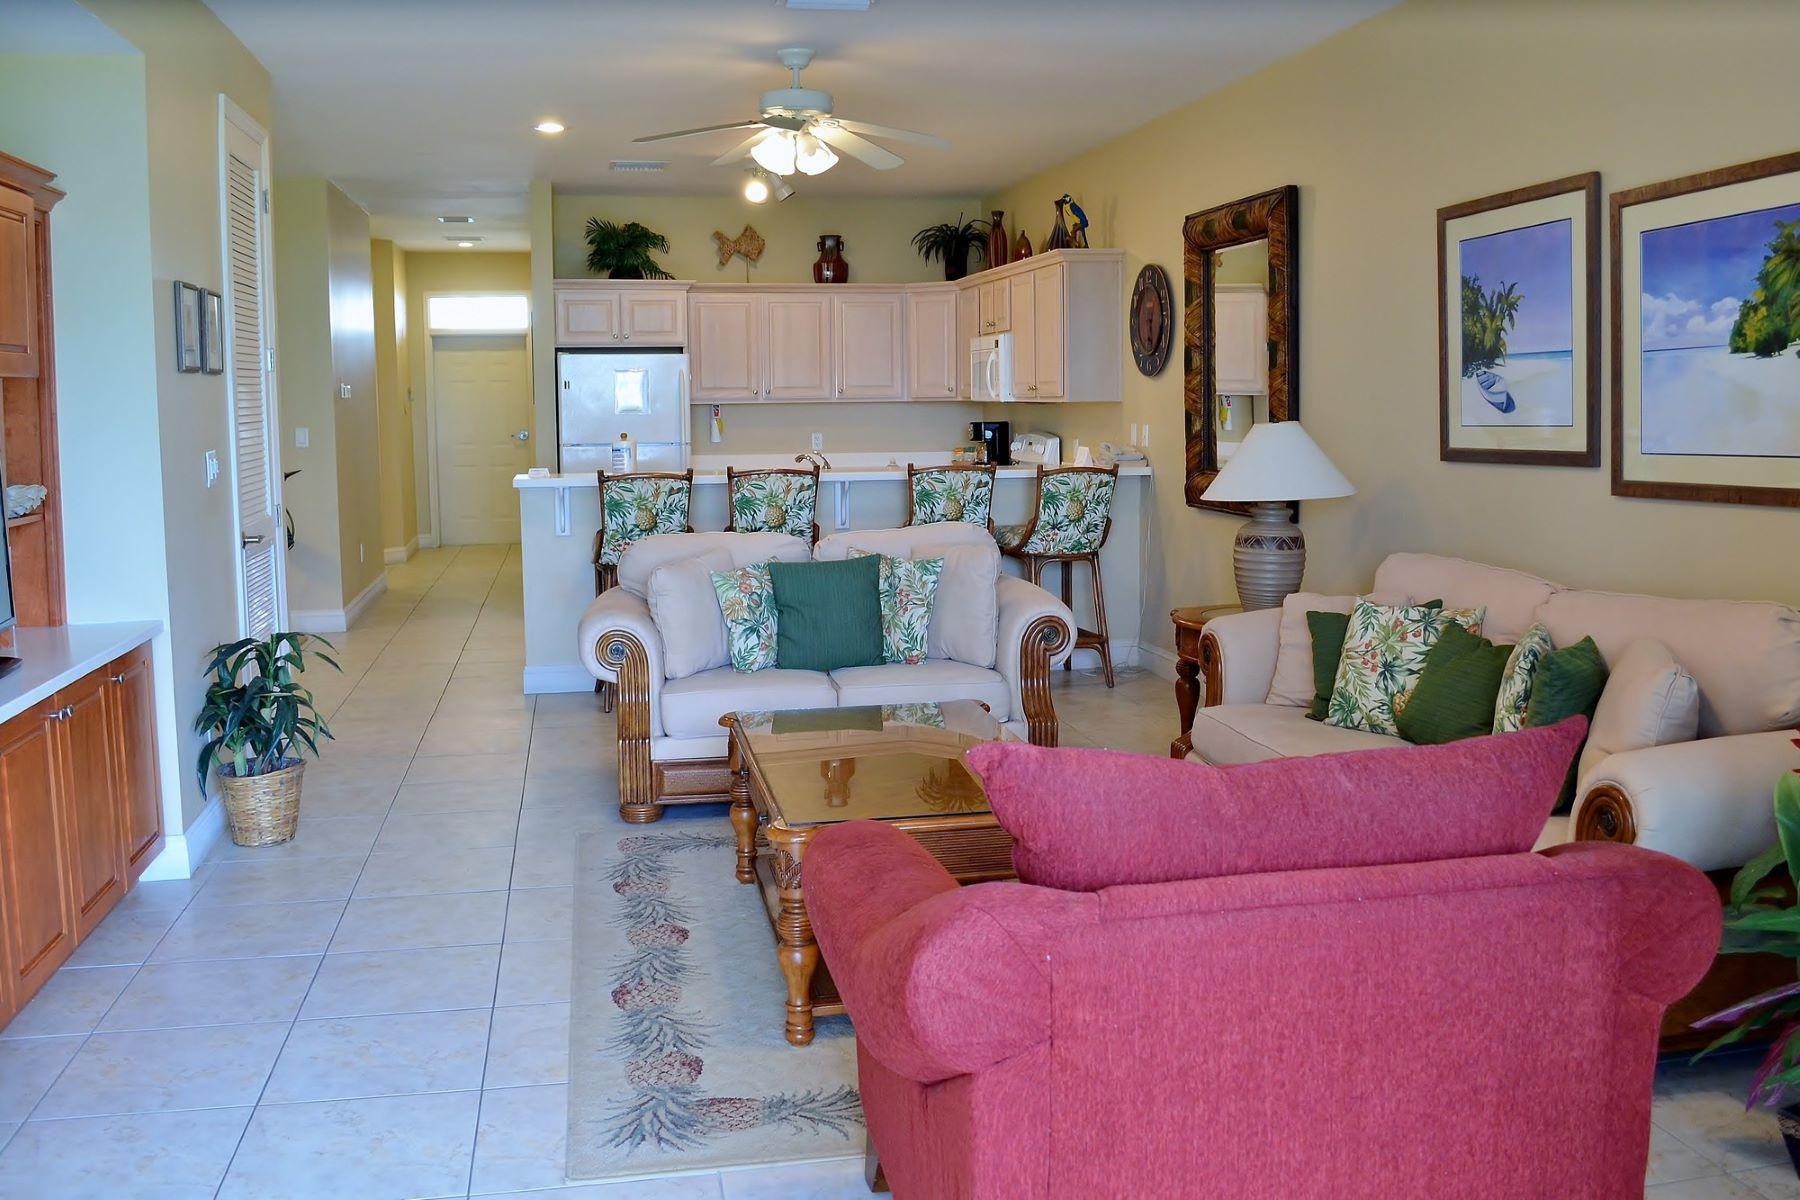 Additional photo for property listing at Bahama Beach Club 2055 Bahama Beach Club, Treasure Cay, 阿巴科 巴哈马